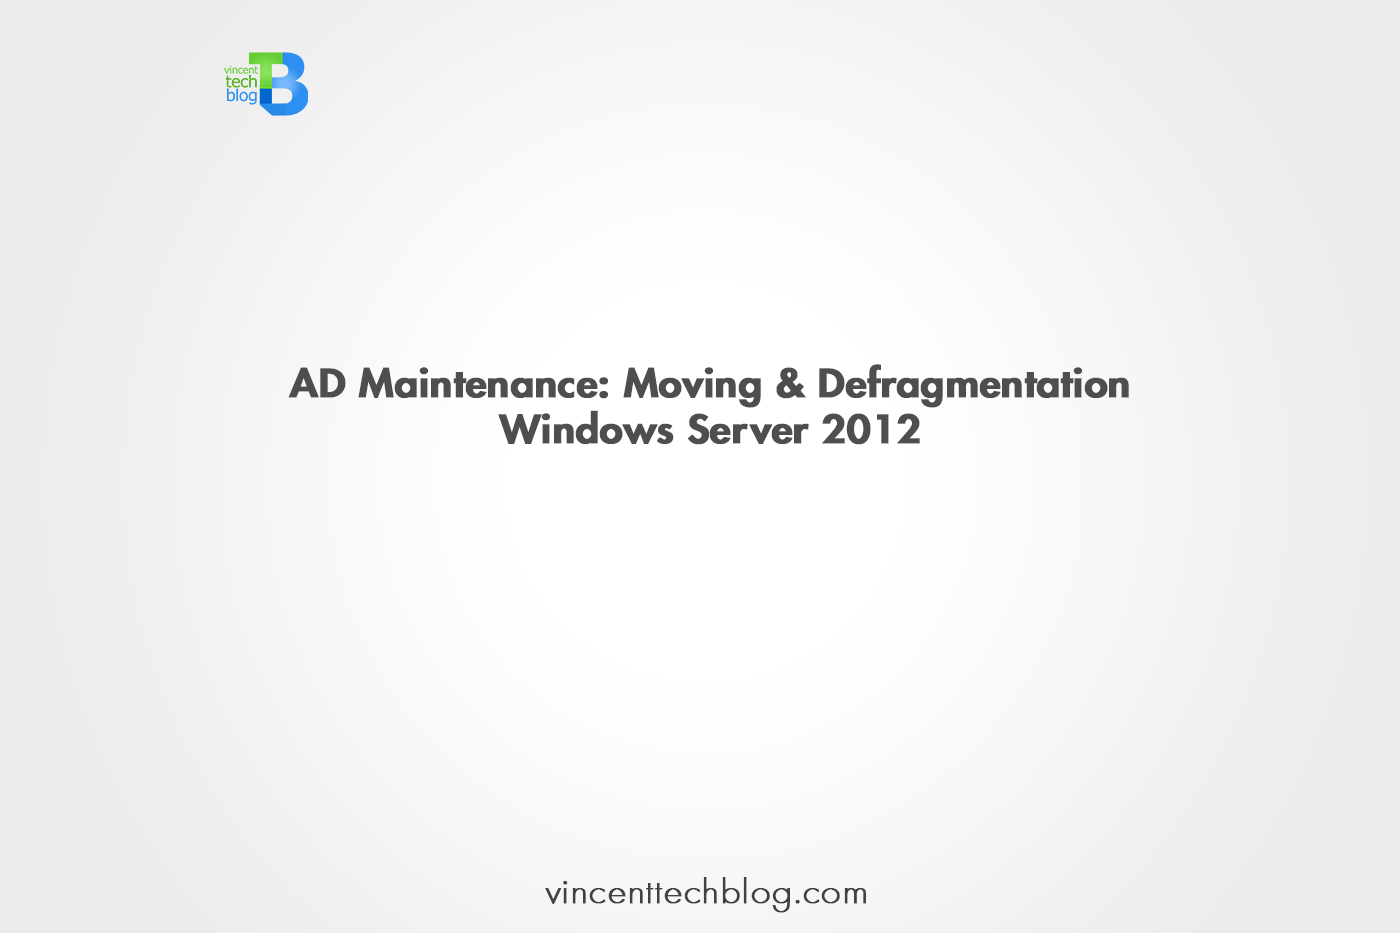 AD Defragmentation